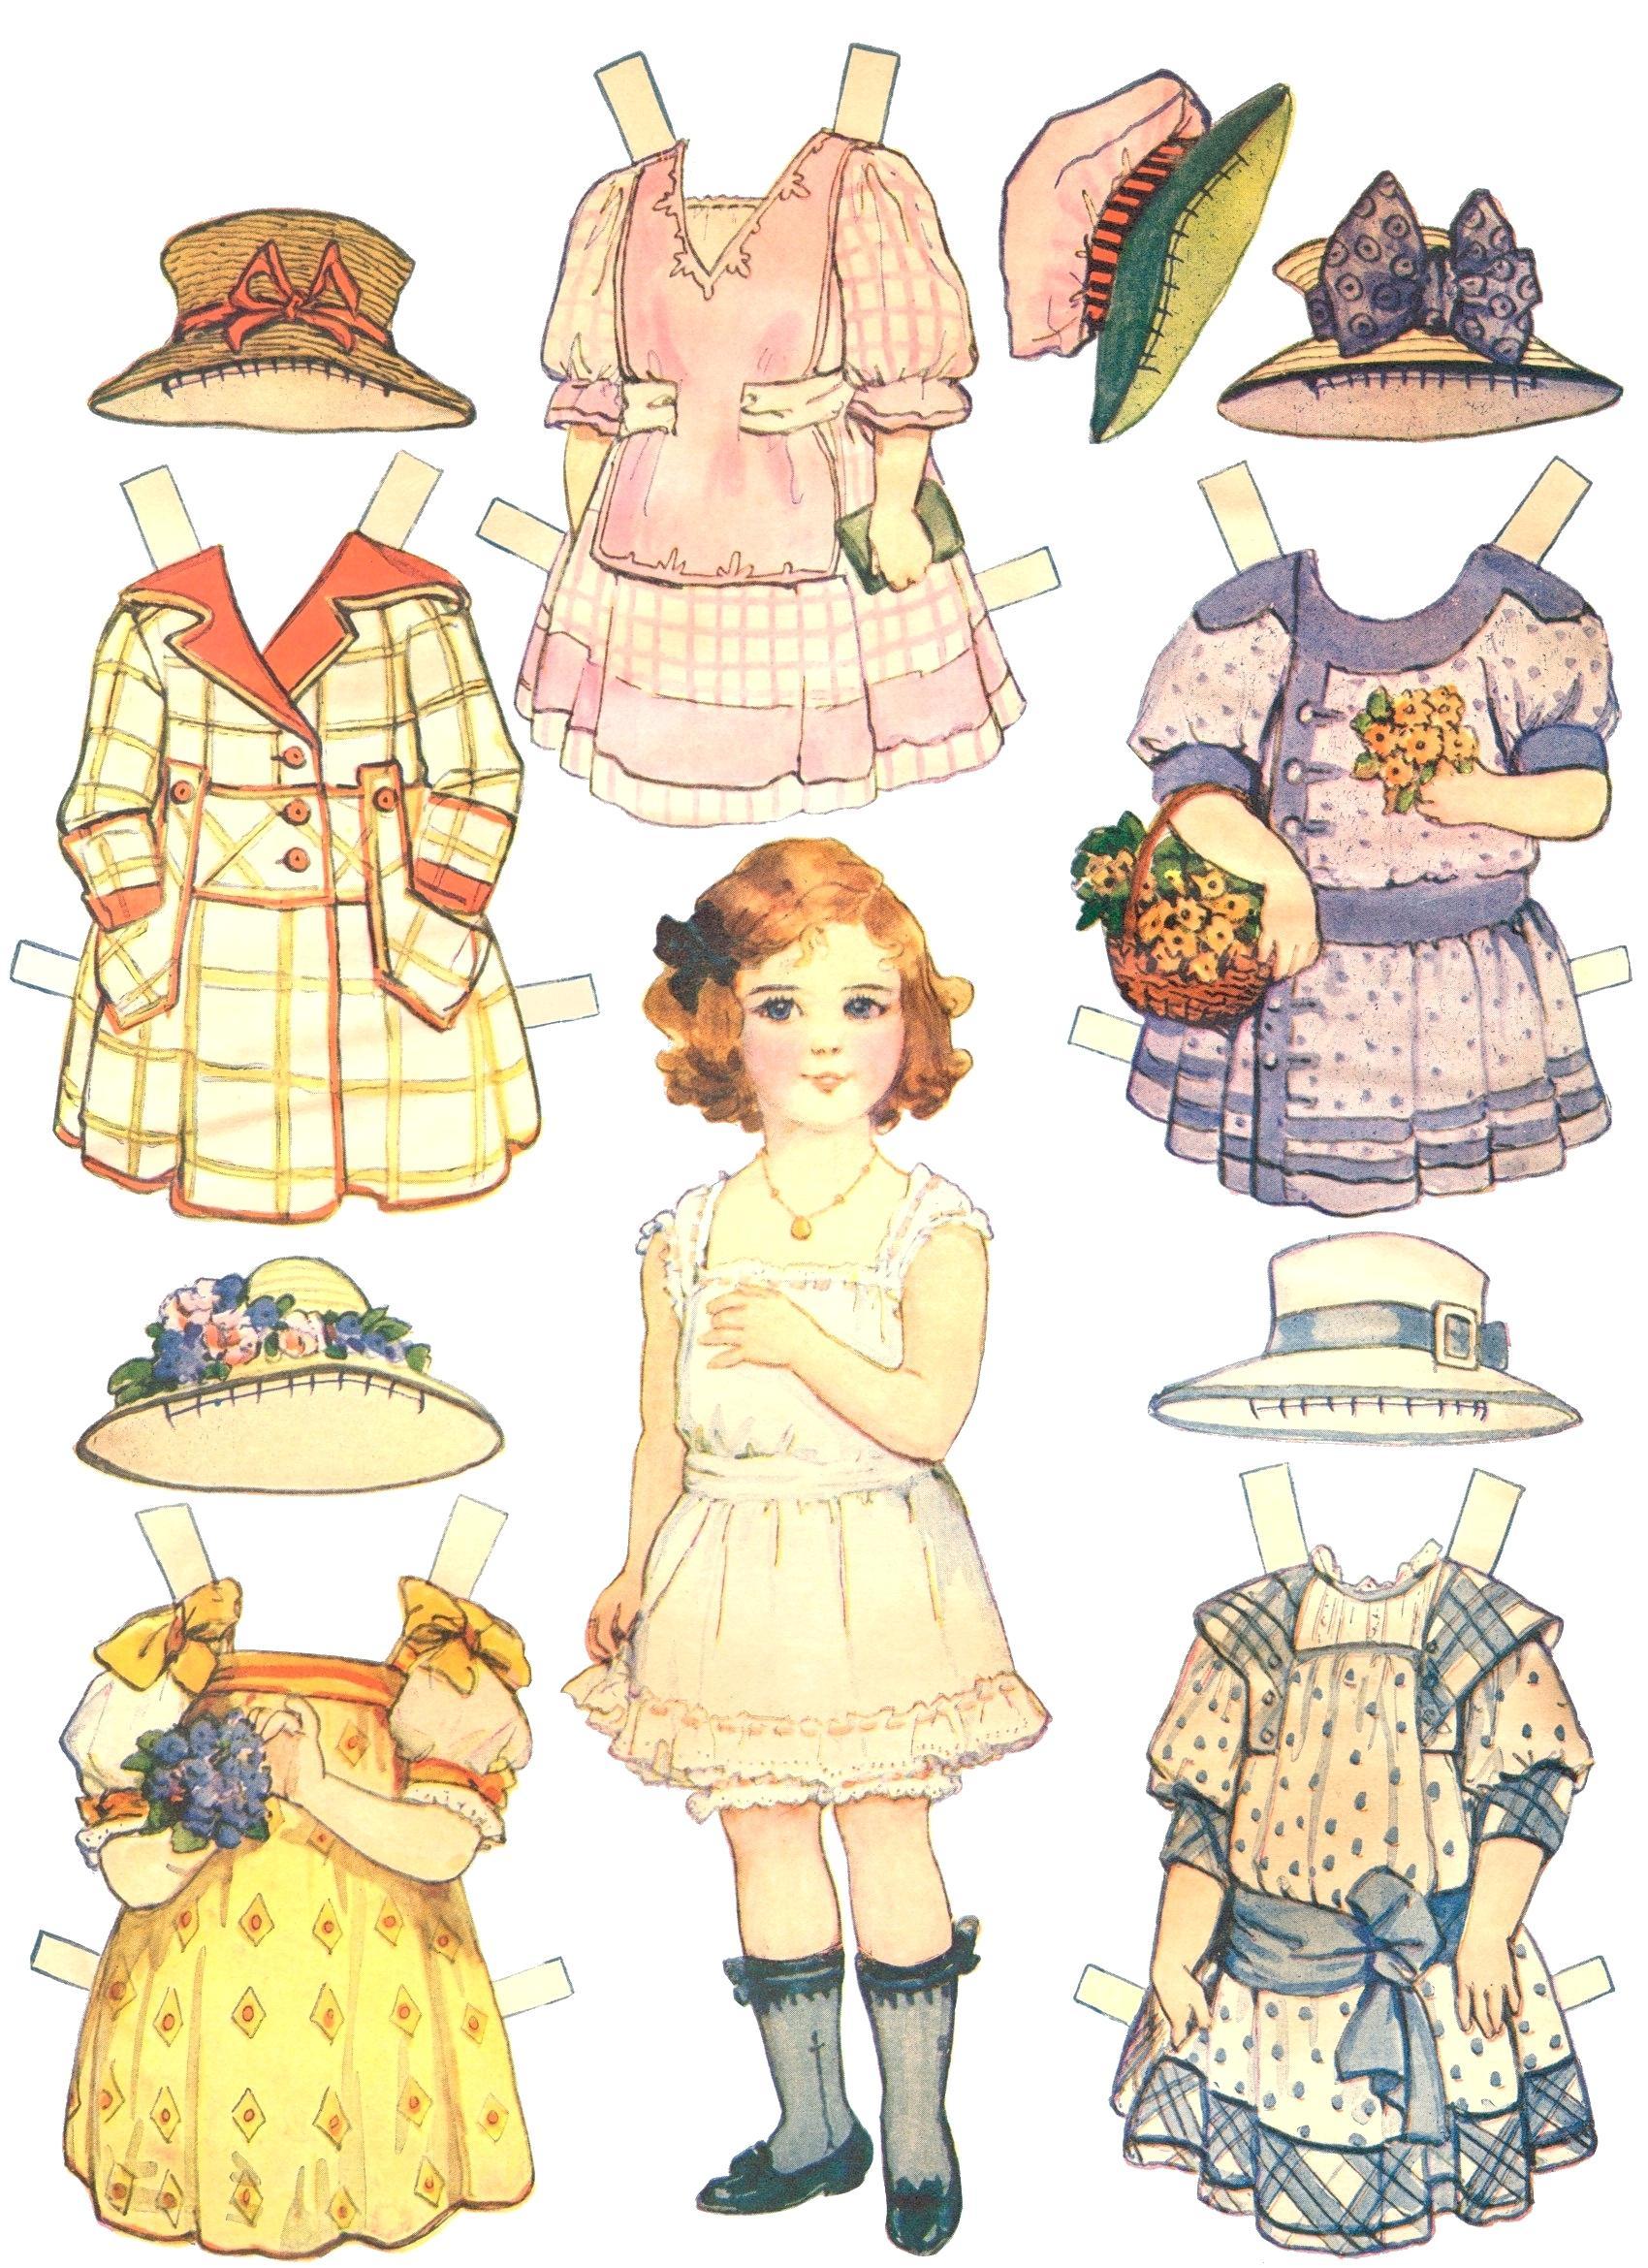 Free Paper Dolls Fairy Tale Paper Doll Printable Free Paper Dolls - Free Printable Paper Dolls